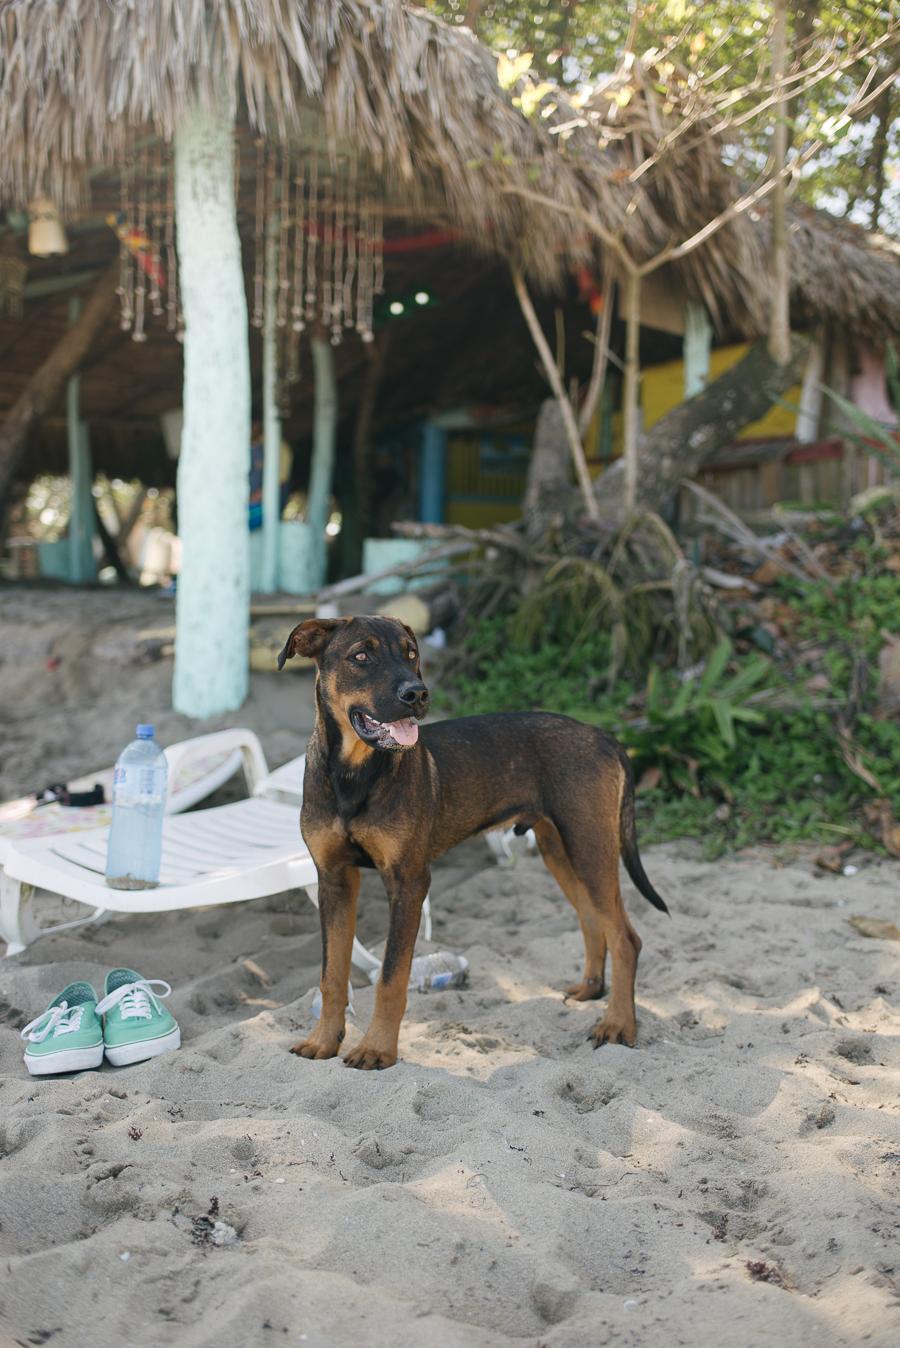 Alex Good-Beautyosaurus Lex-Dominican Republic-travel guide-Punta Cana-Beach-Holiday-Vacation-lifestyle blog-Playa Encuentro